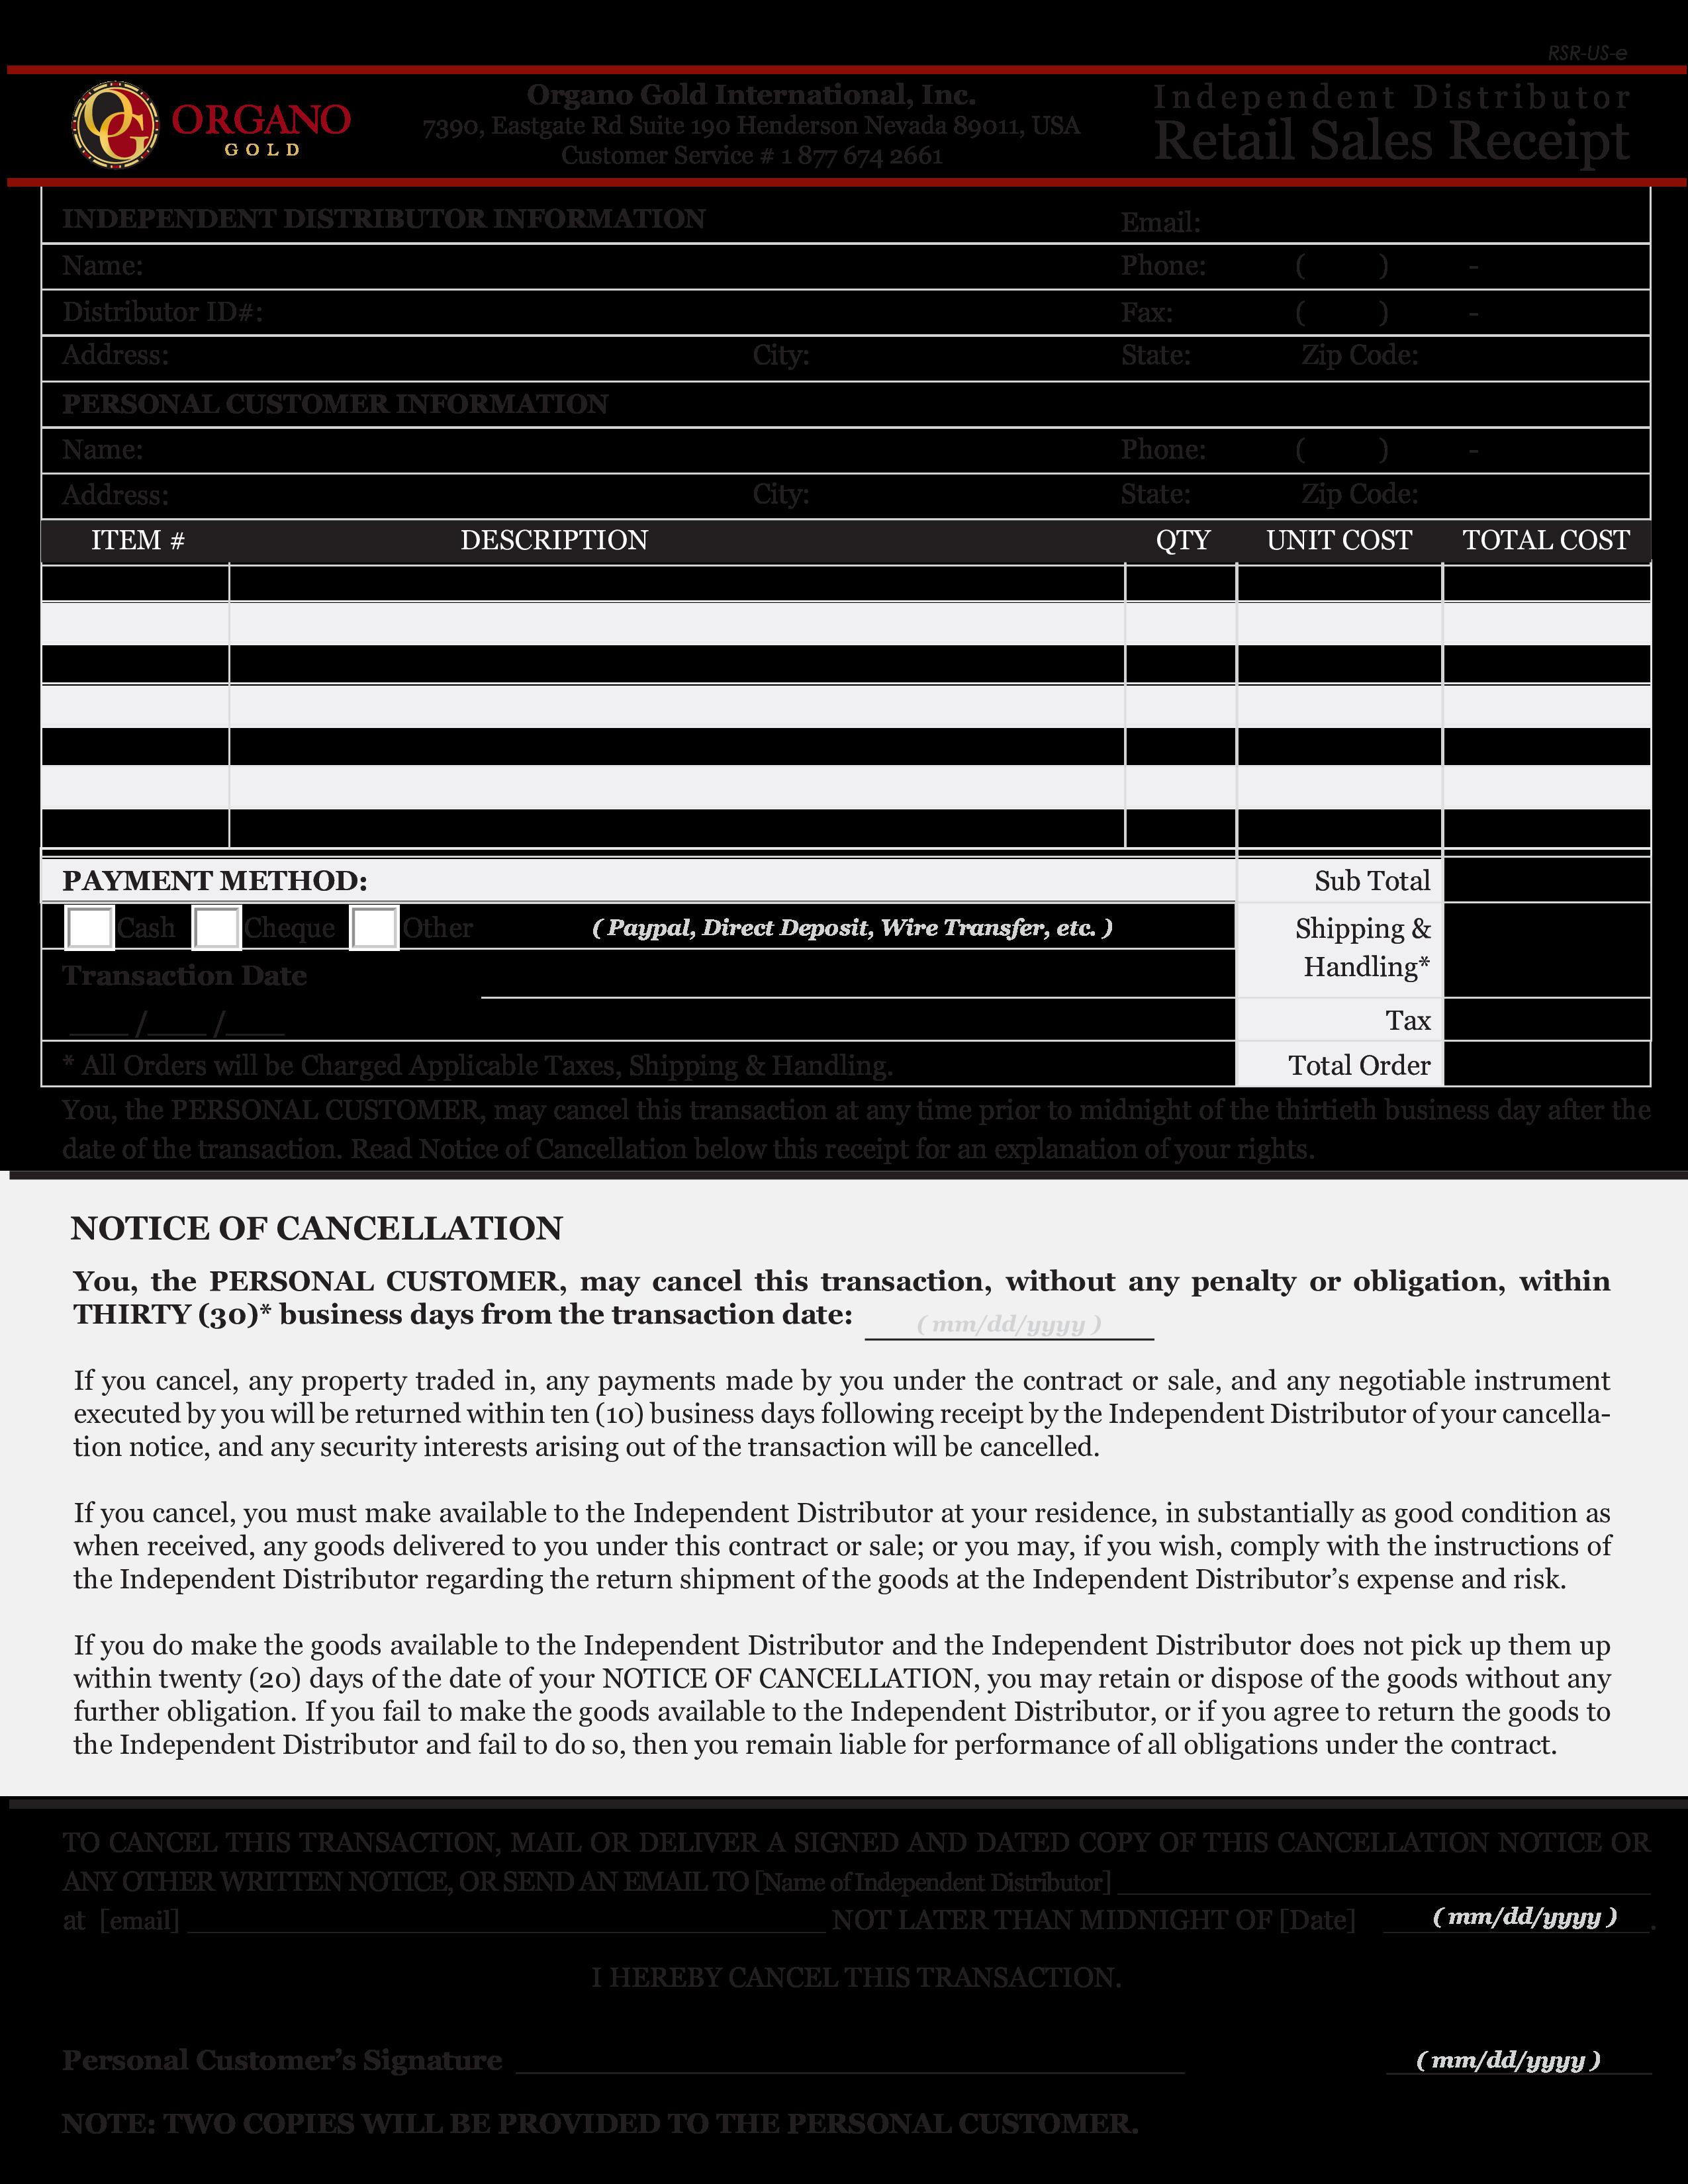 free retail sales receipt templates at